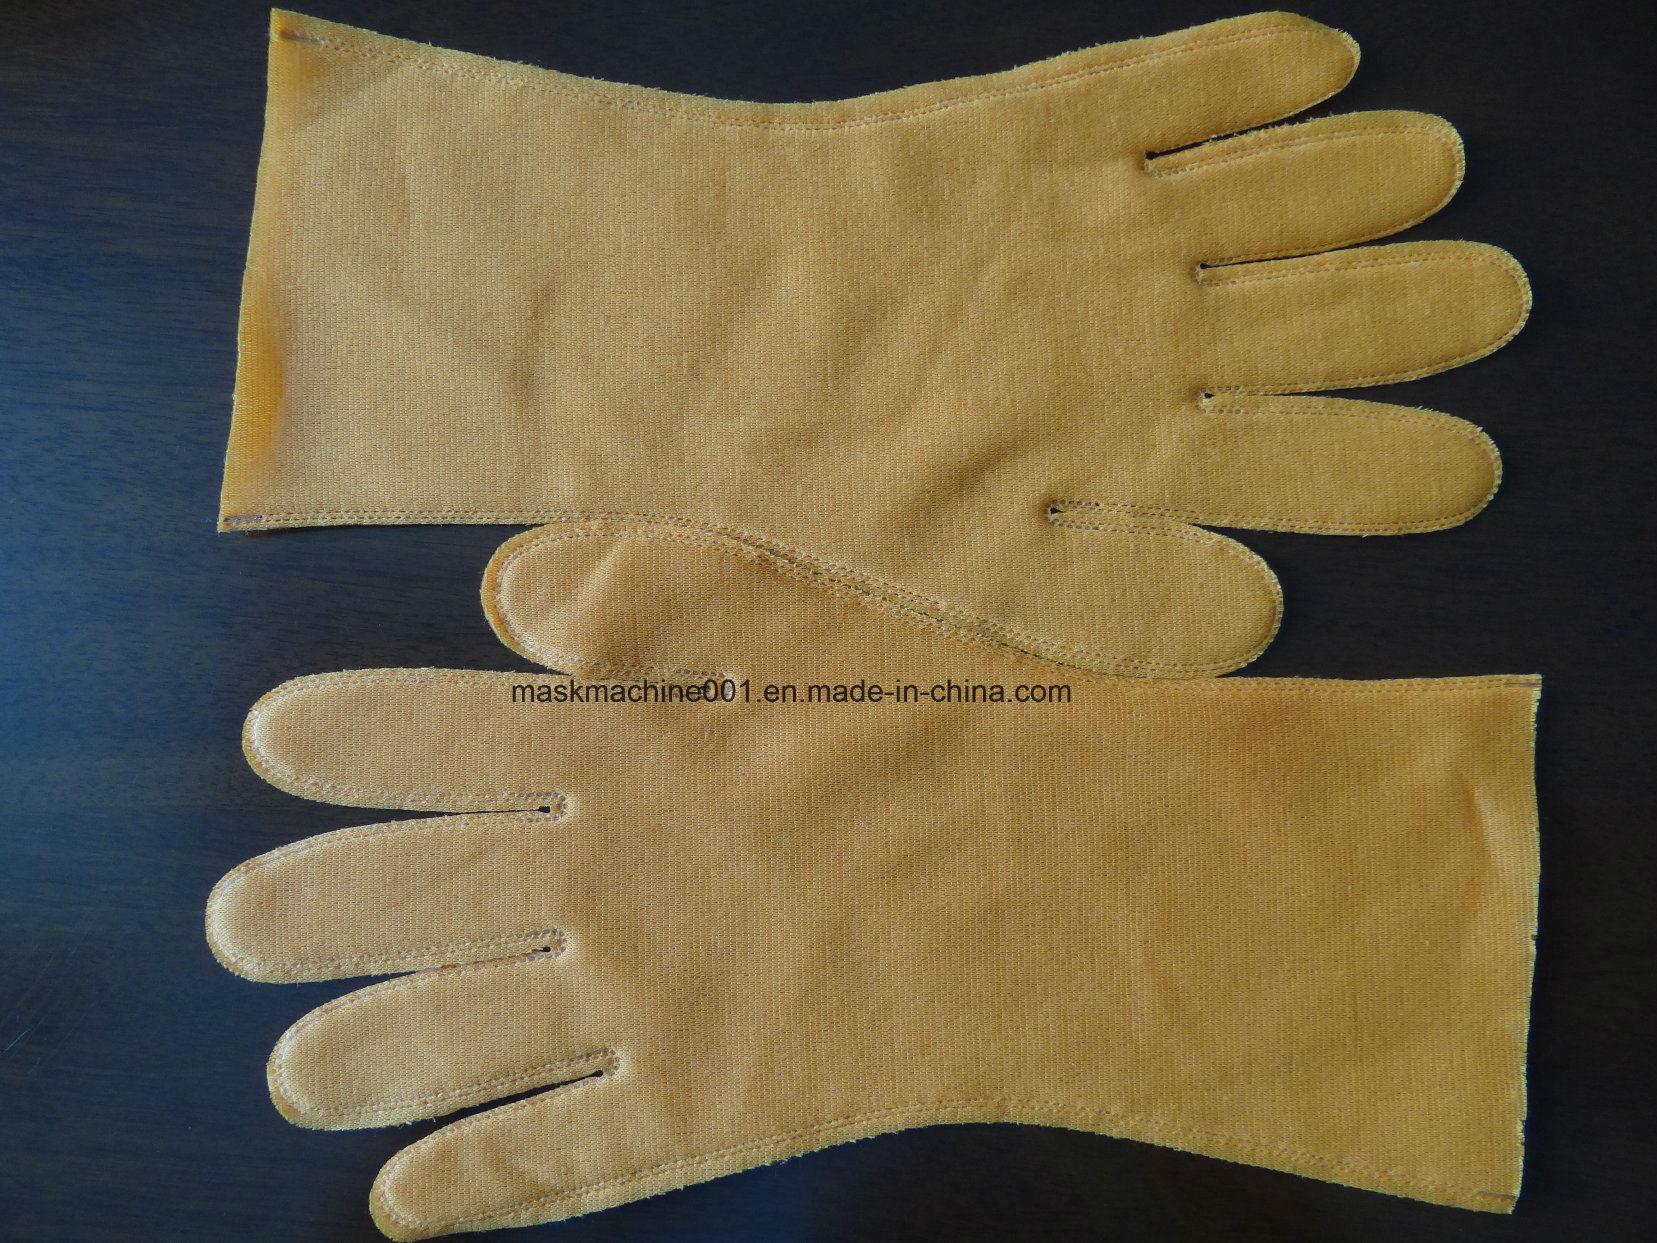 Automatic Velvet Glove Making Machine